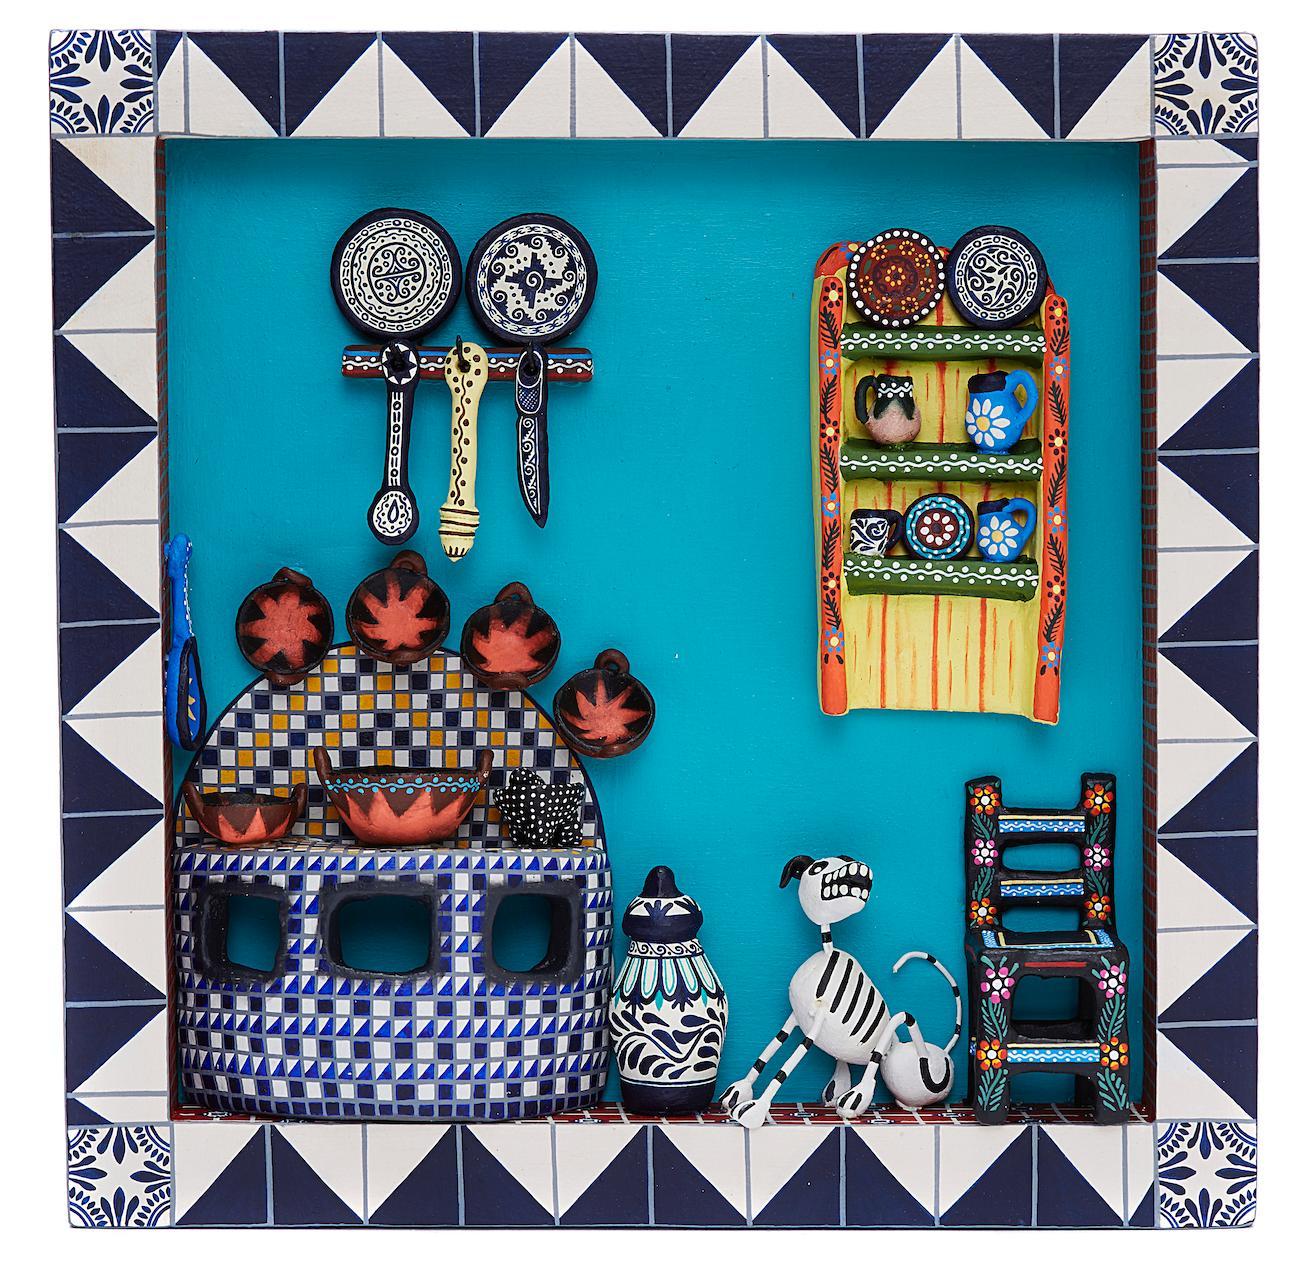 Cuadro Cocina Talavera - Talavera Kitchen - Mexican Folk Art  Cactus Fine Art